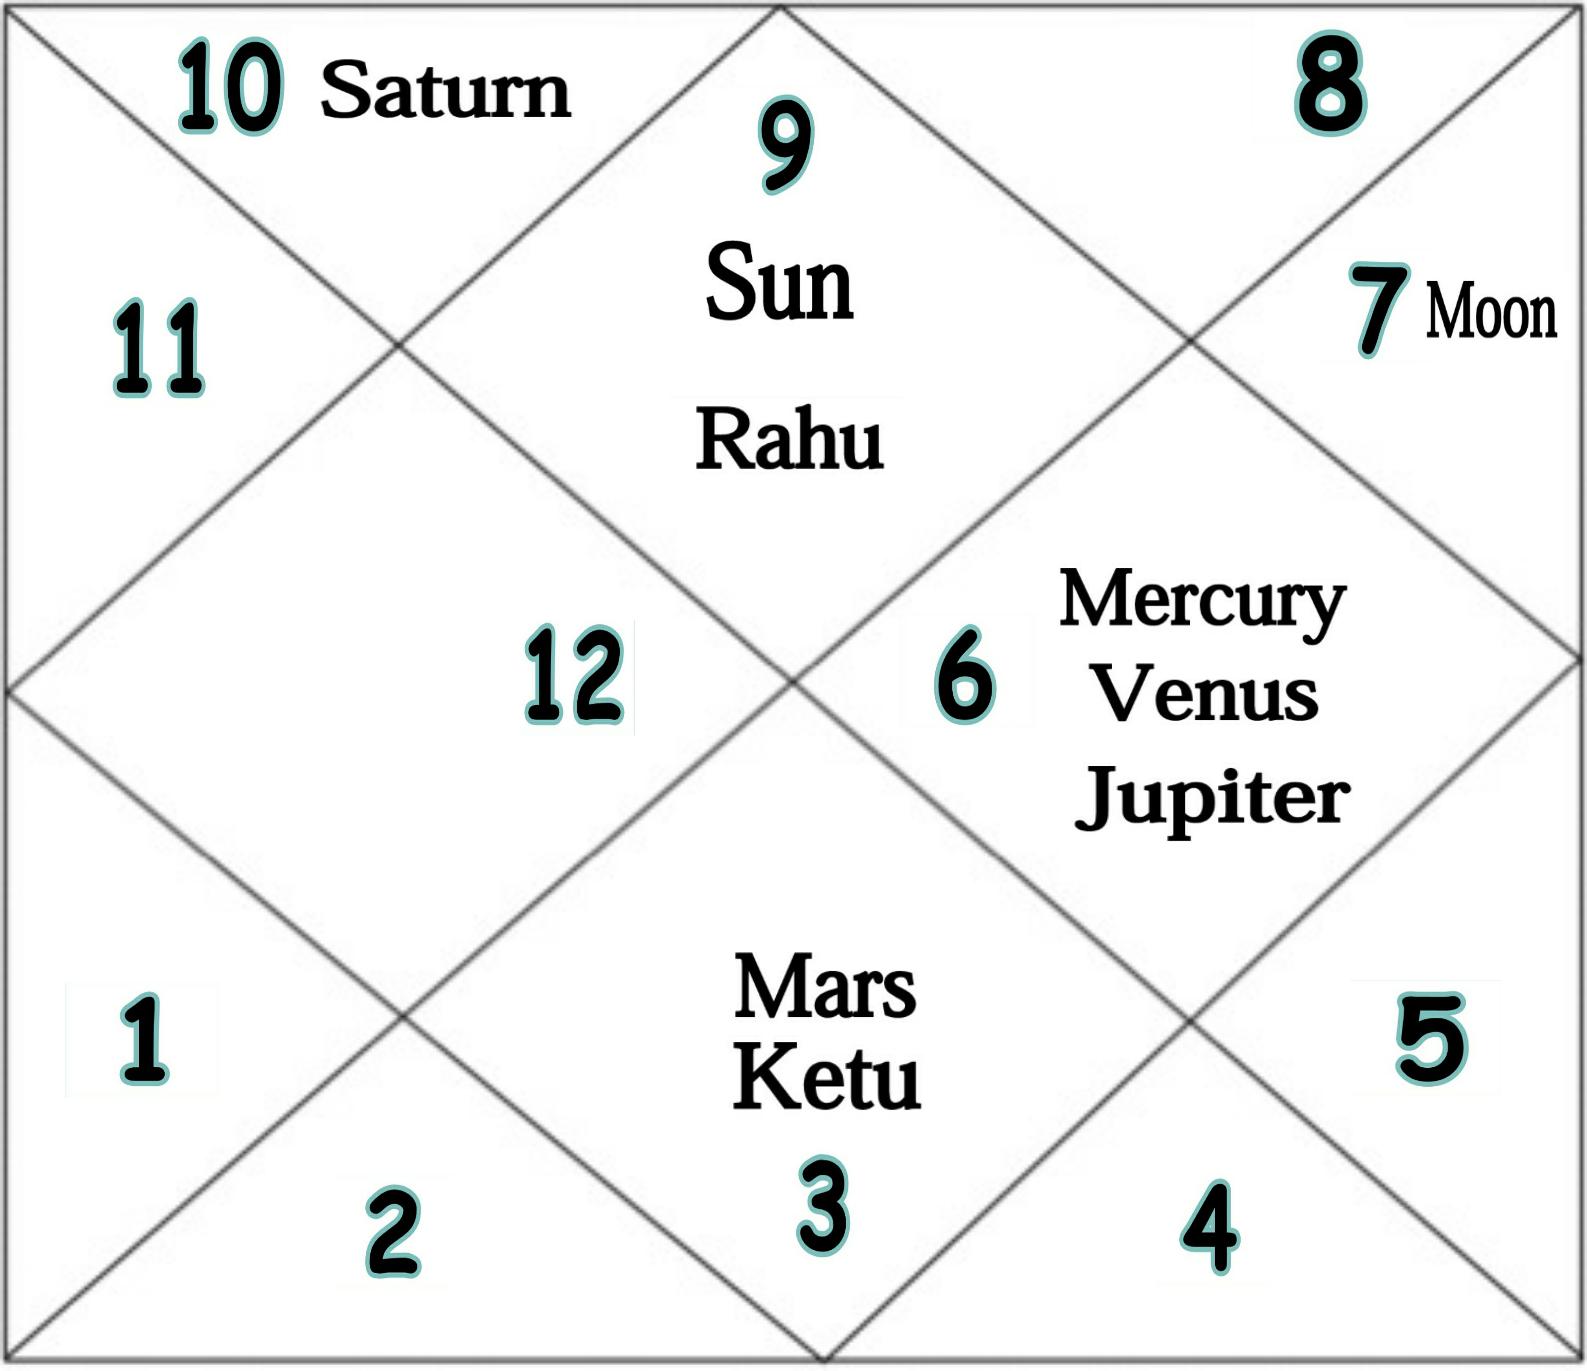 Laabh mandook hora chart of dhirubhai ambani thevedichoroscope image nvjuhfo Choice Image